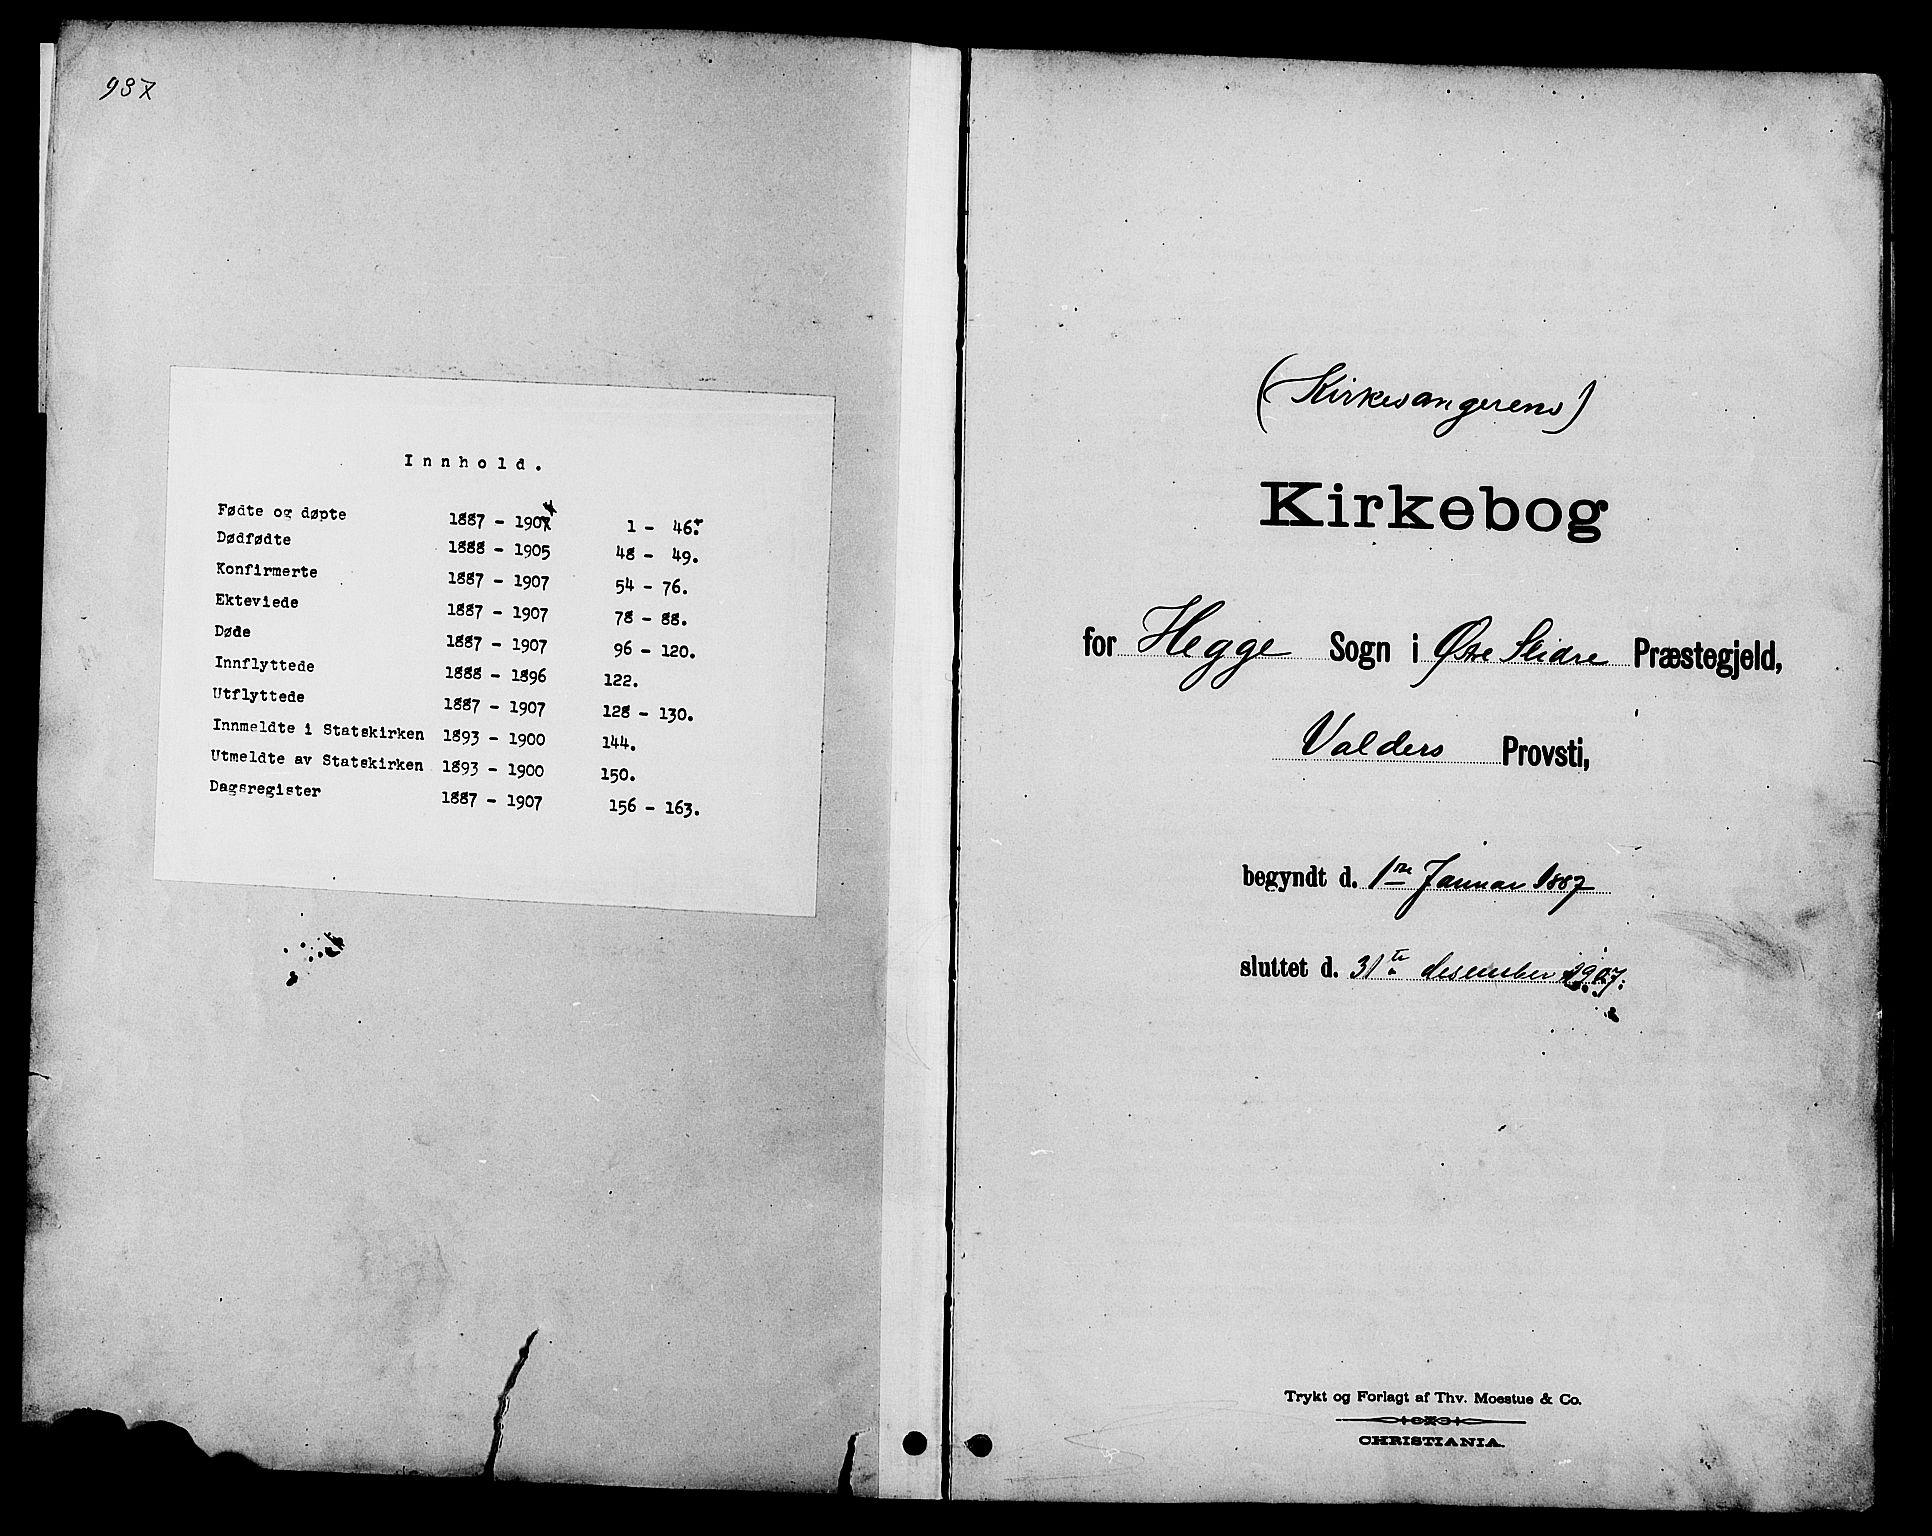 SAH, Øystre Slidre prestekontor, Klokkerbok nr. 4, 1887-1907